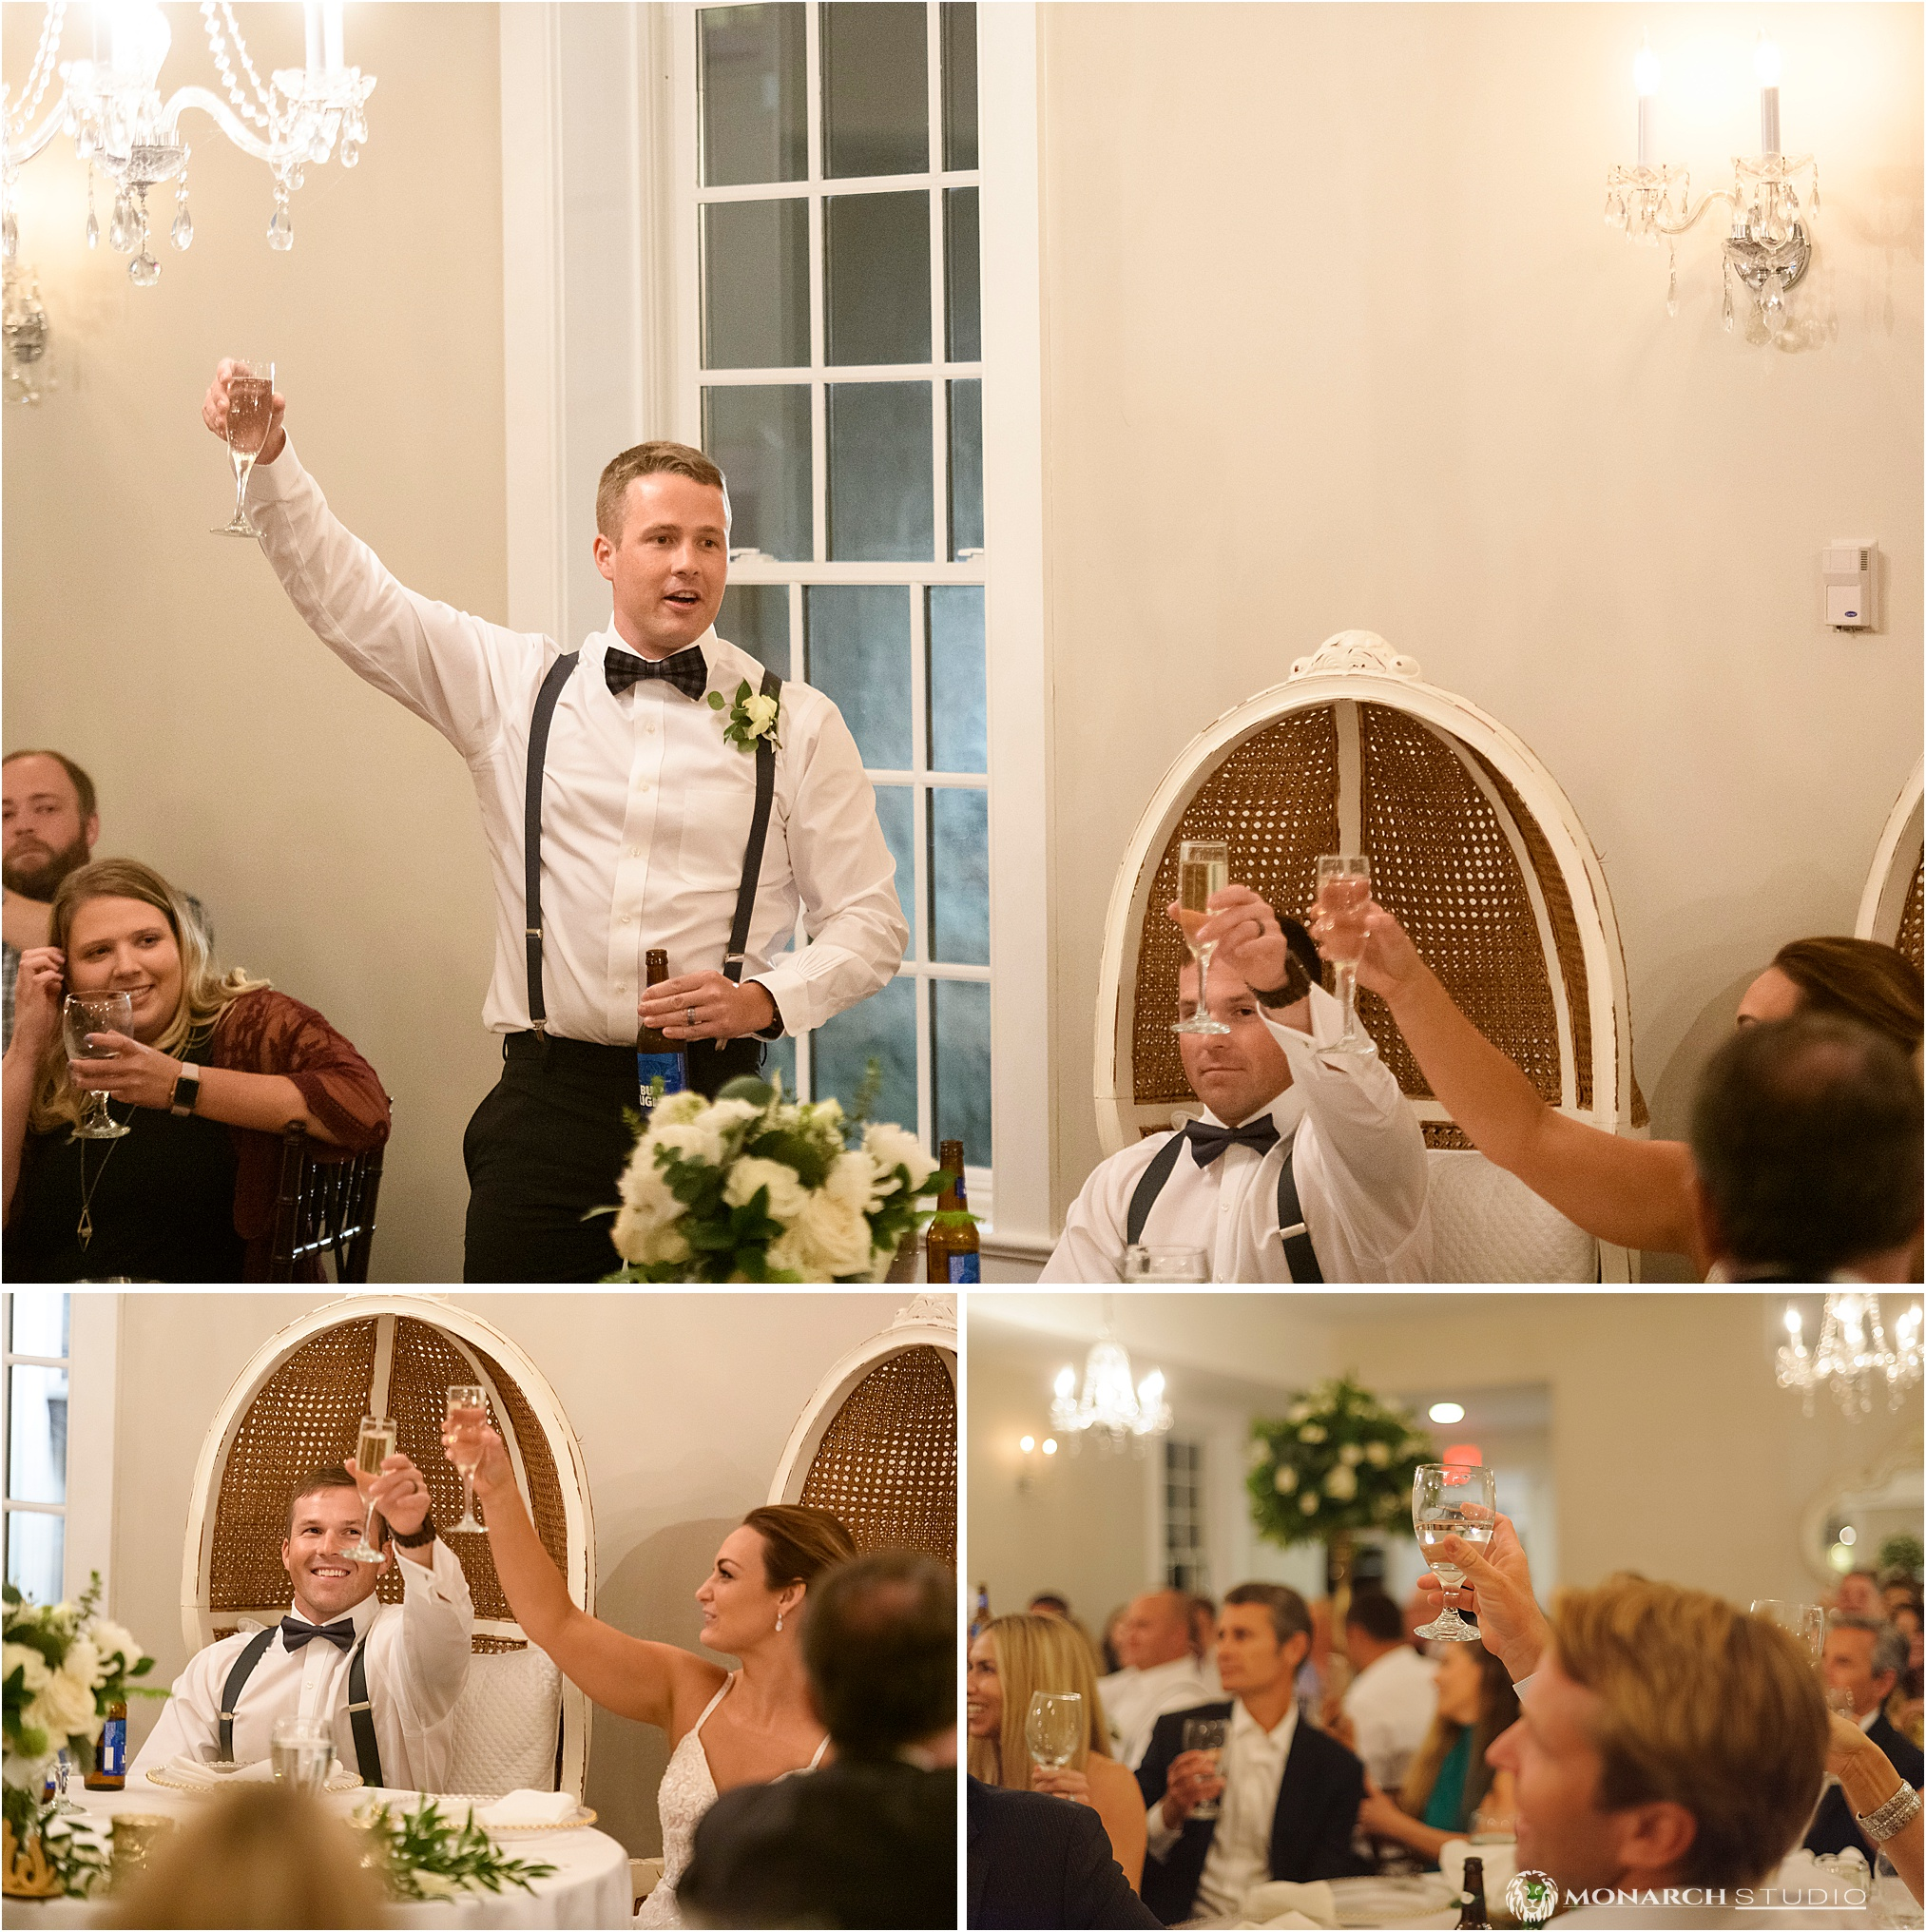 098-whiteroom-wedding-photographer-2019-05-22_0080.jpg